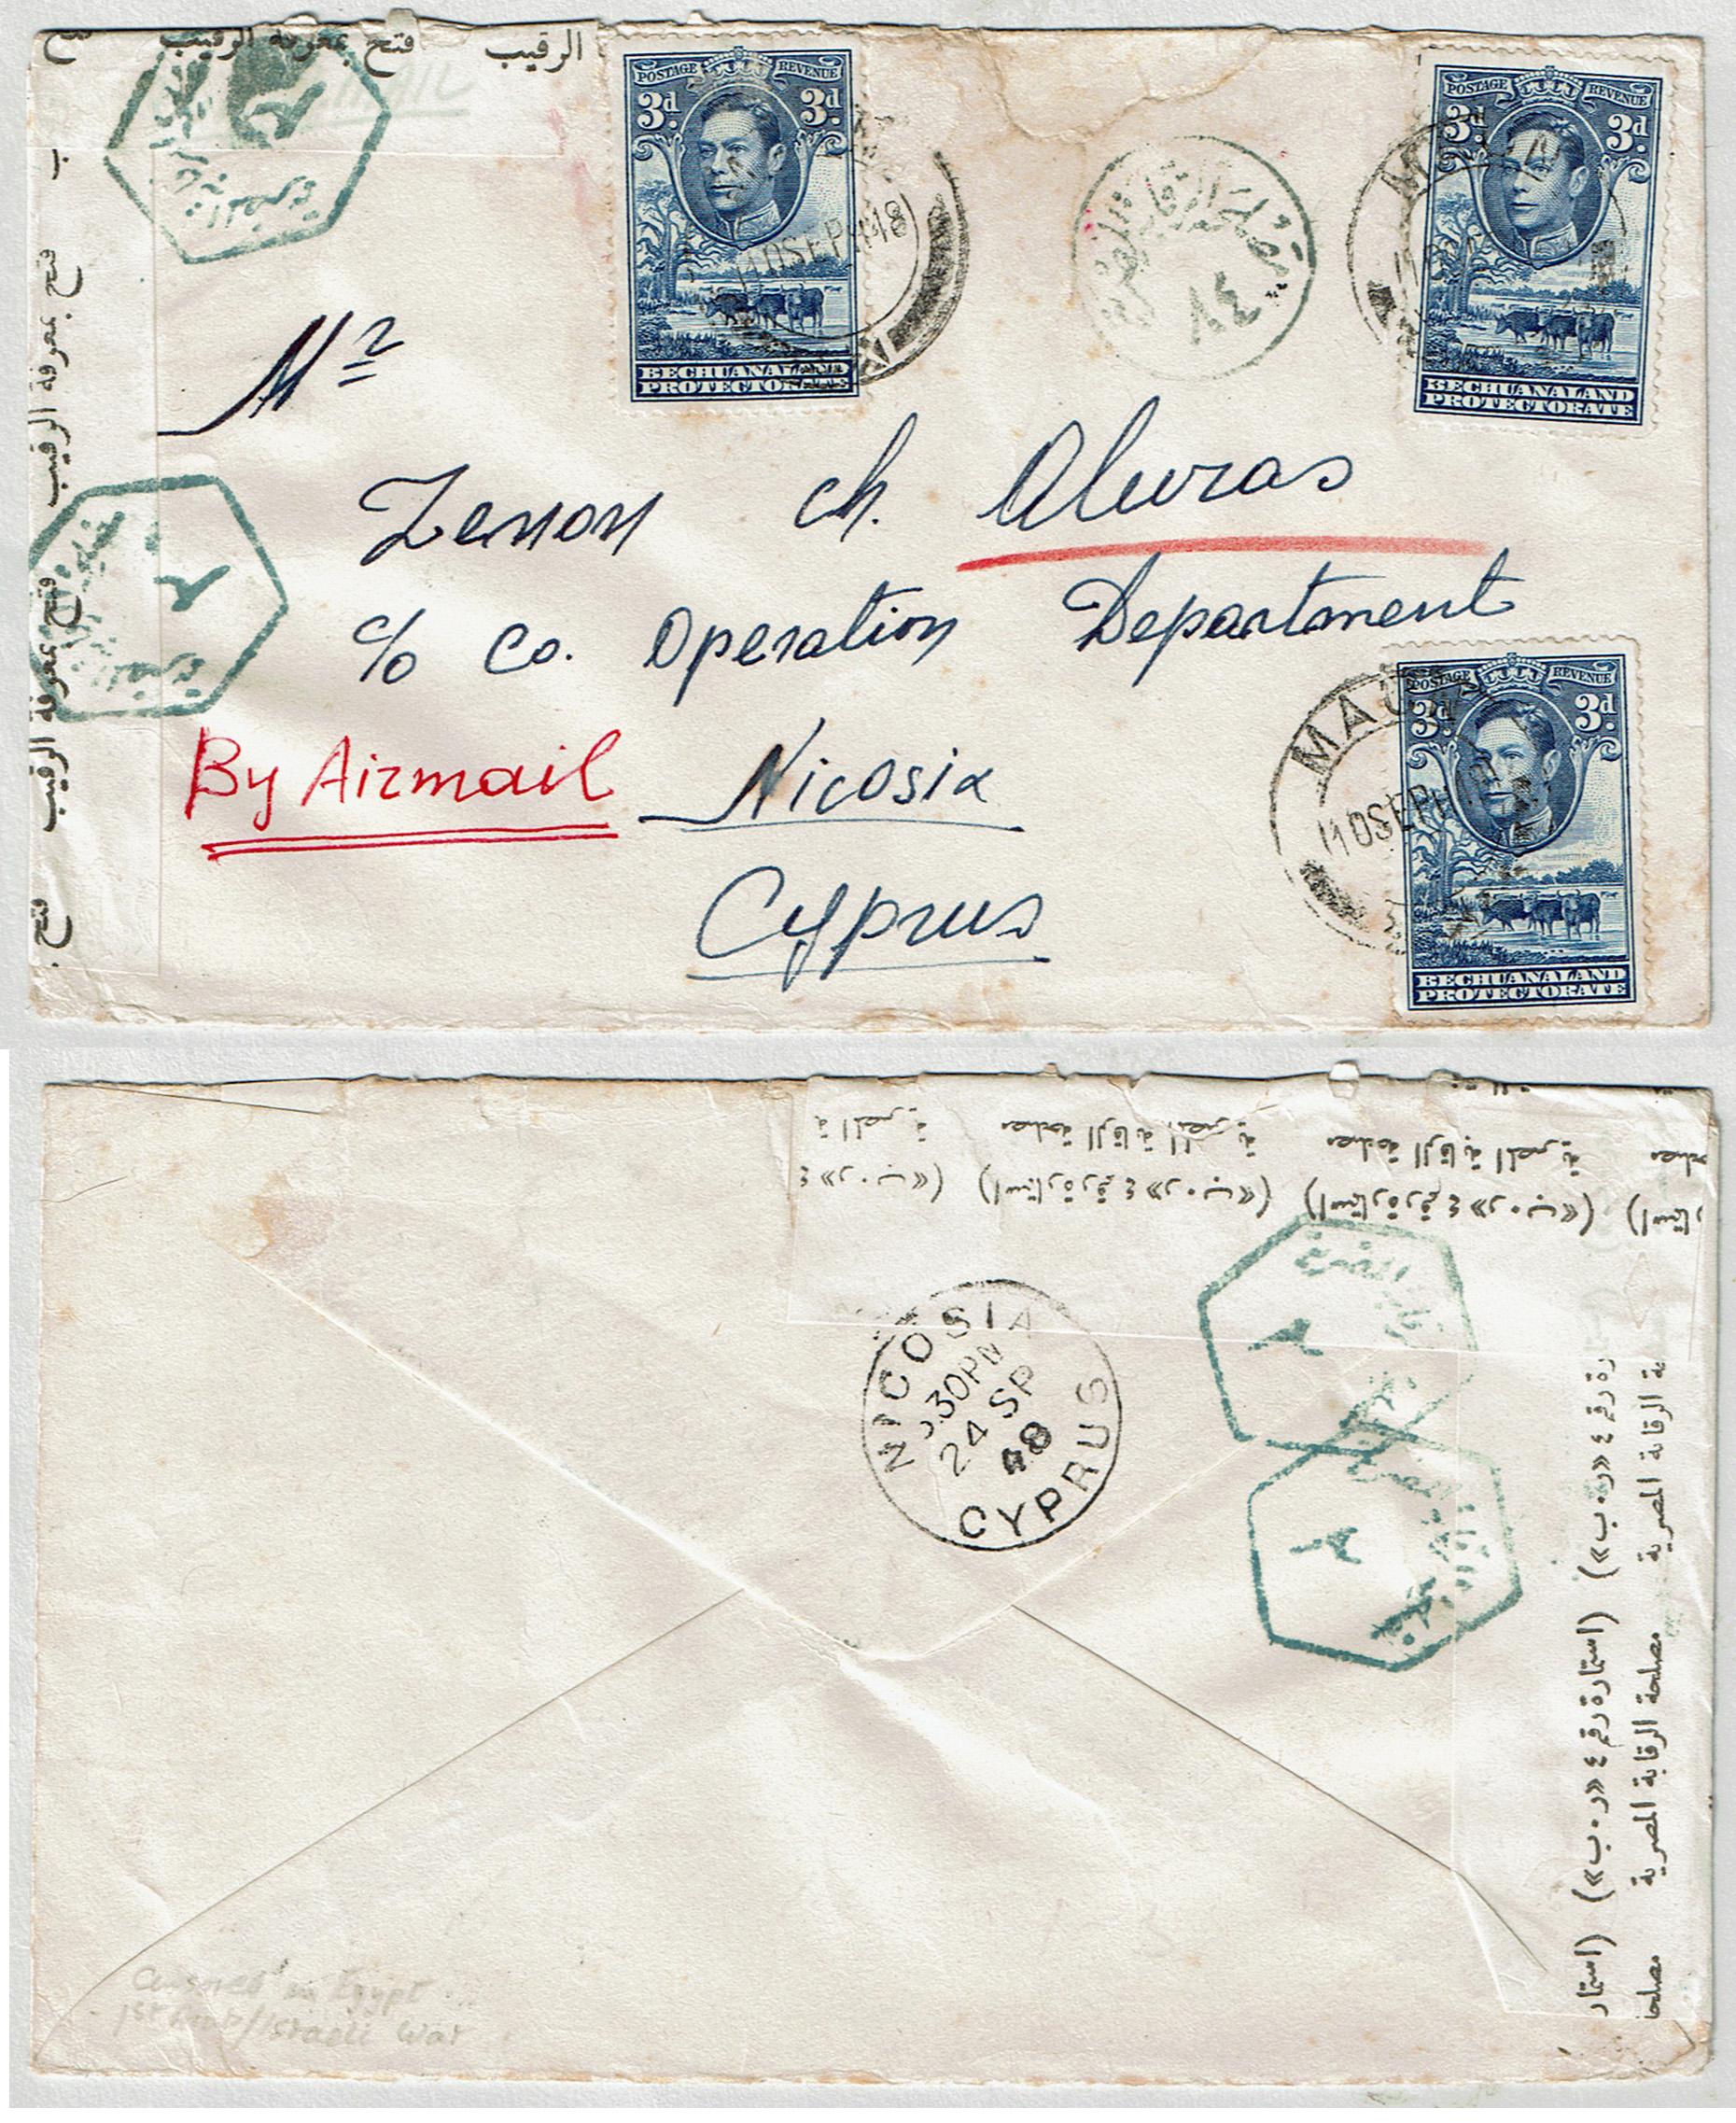 Bech_Cyprus_Egypt_1948.jpg